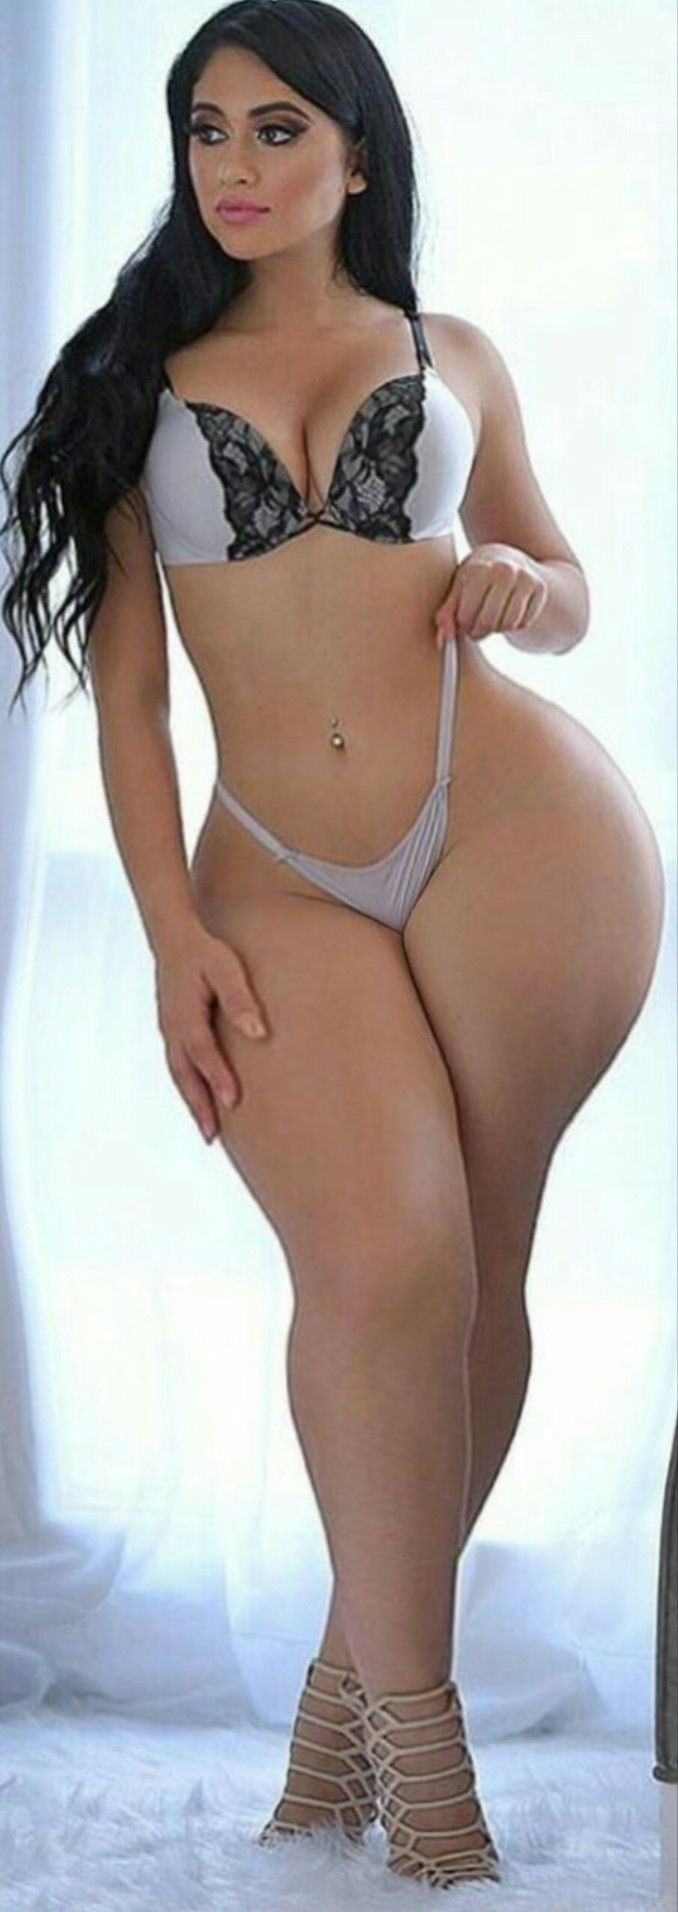 olinda castielle nude pussy-tube porn video